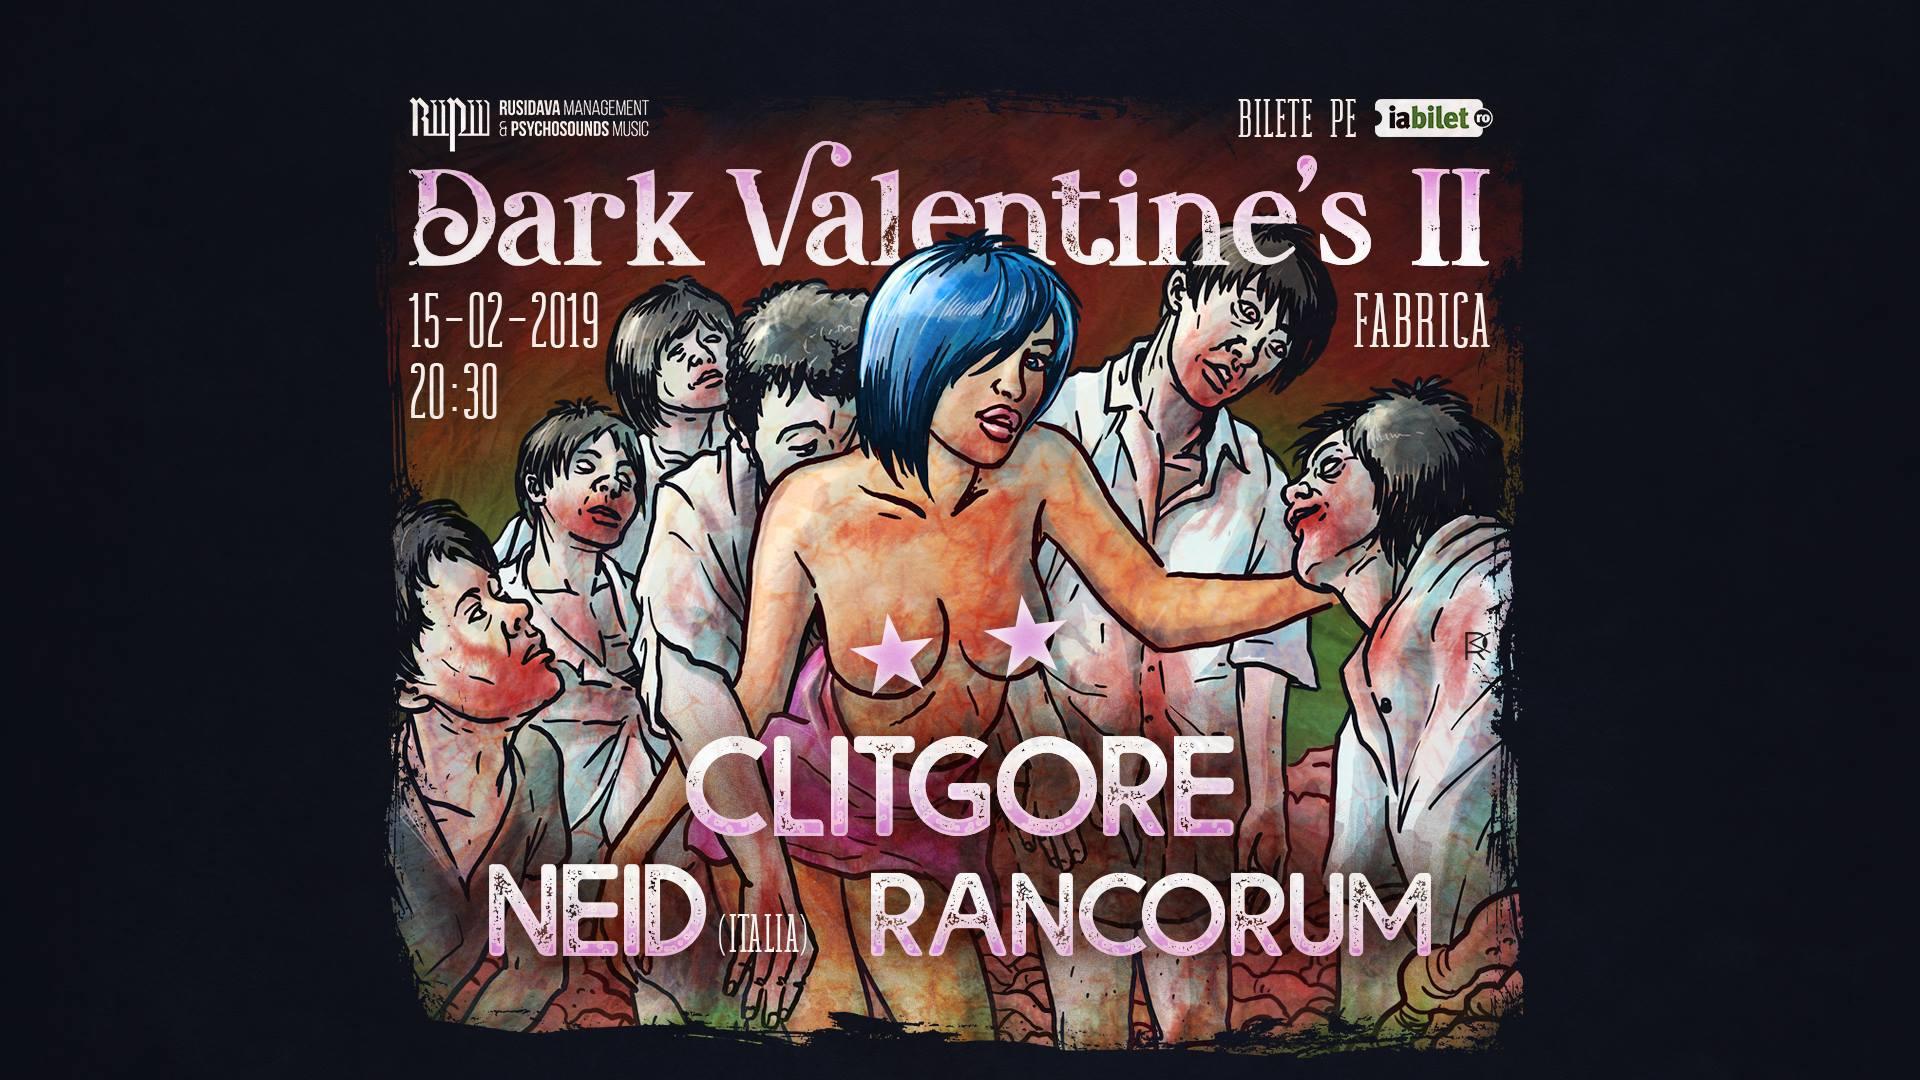 Dark Valentine's II Clitgore, Neid, Rancorum 2019